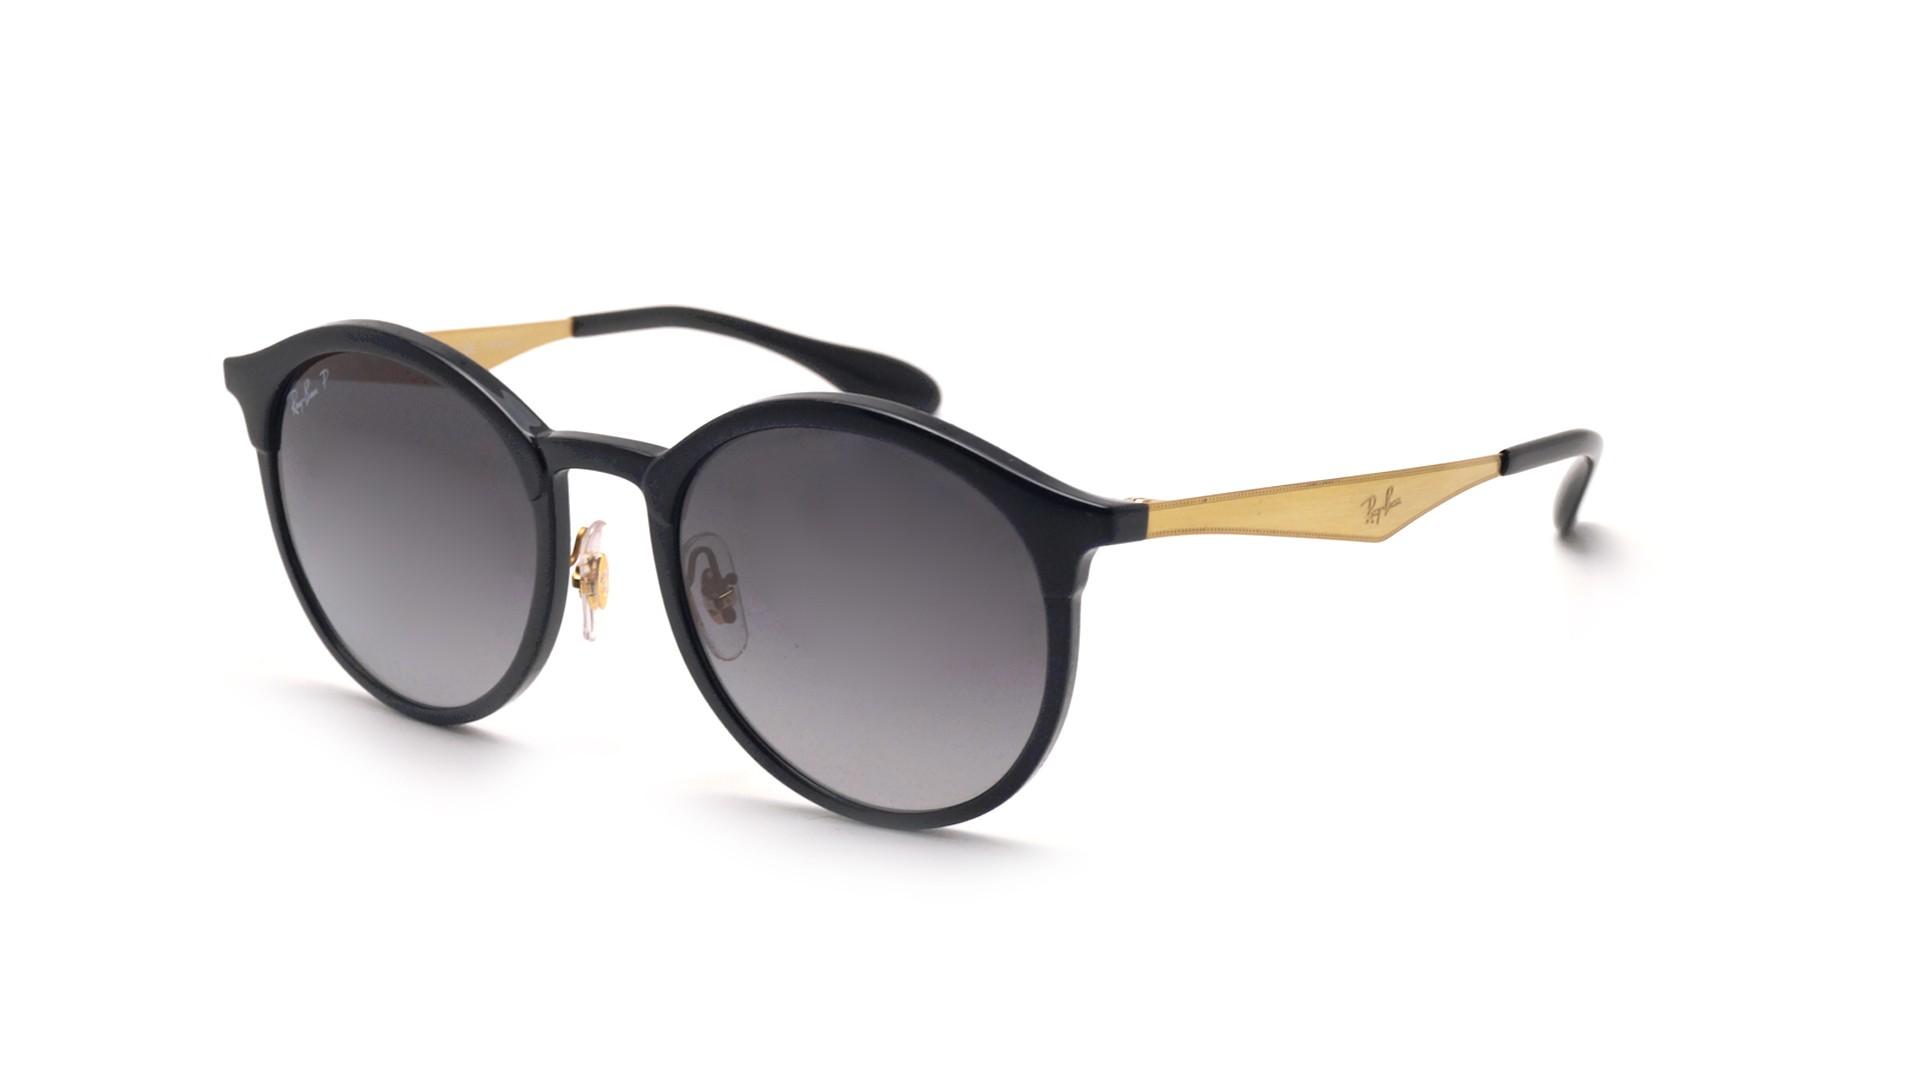 Sunglasses Ray-Ban Emma RB4277 6306 T3 51-21 Black Medium Polarized Gradient af65437aa520